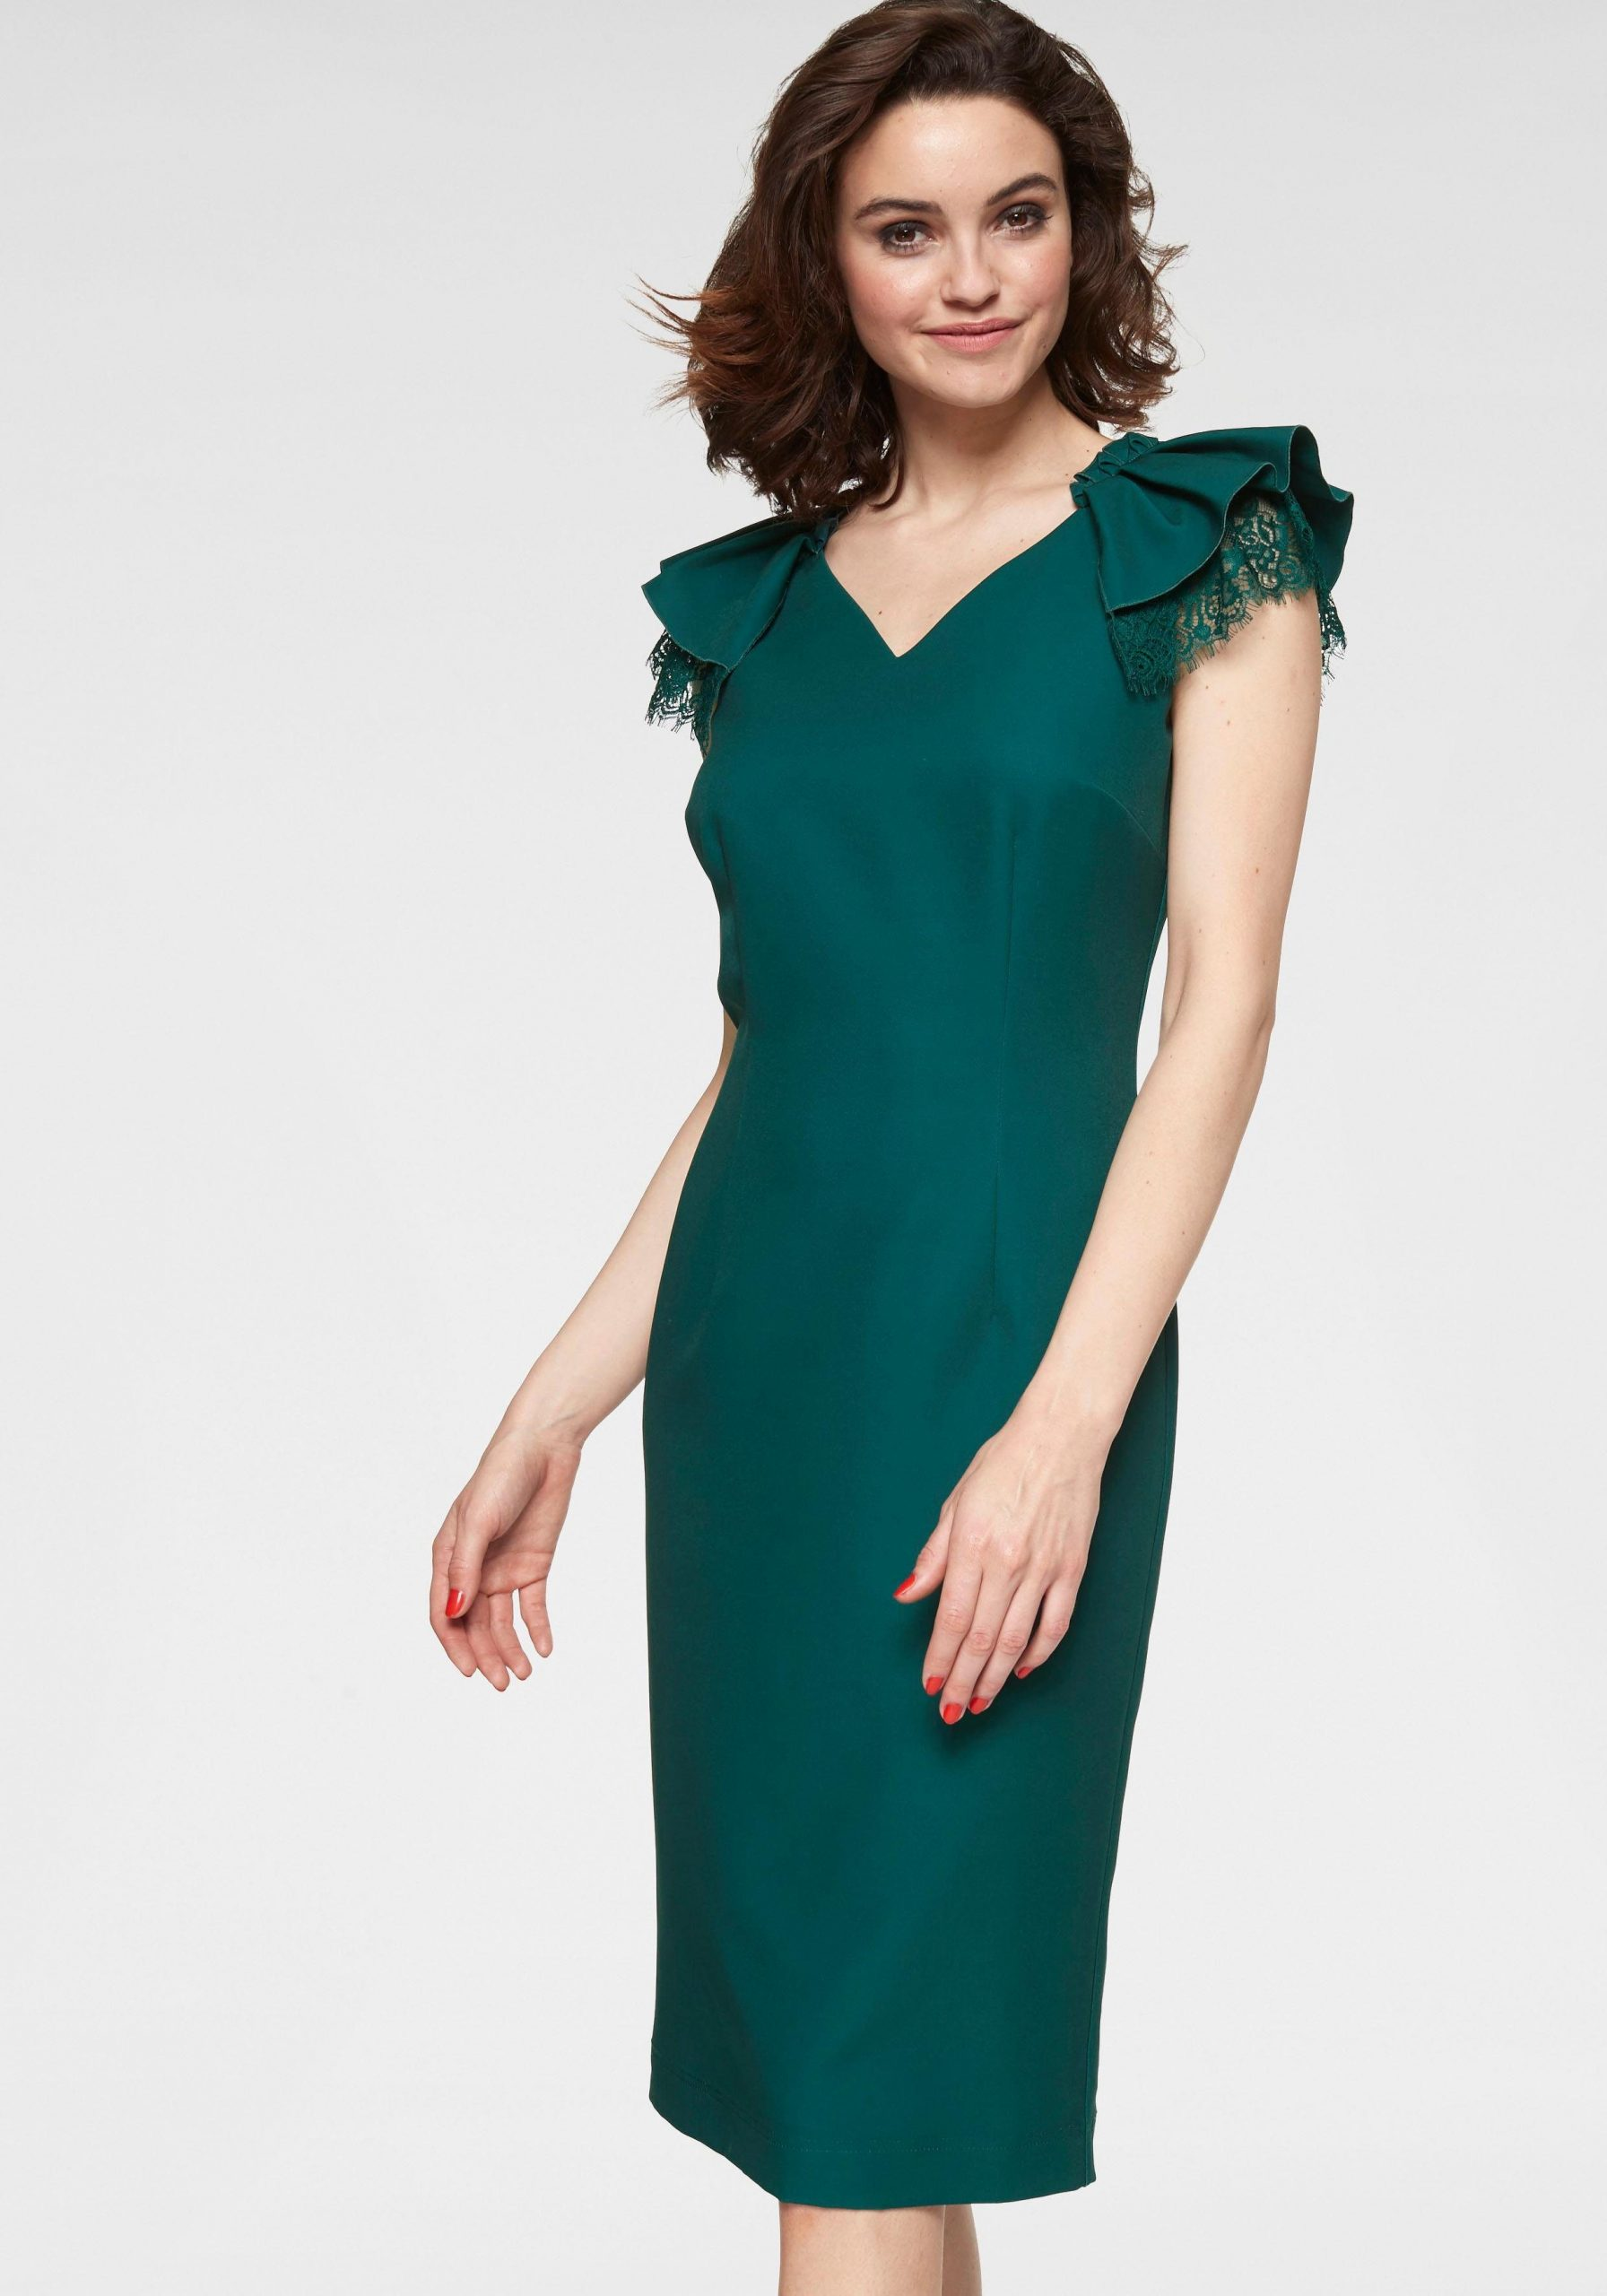 Top Guido Maria Kretschmer Abendkleid Design13 Luxus Guido Maria Kretschmer Abendkleid für 2019